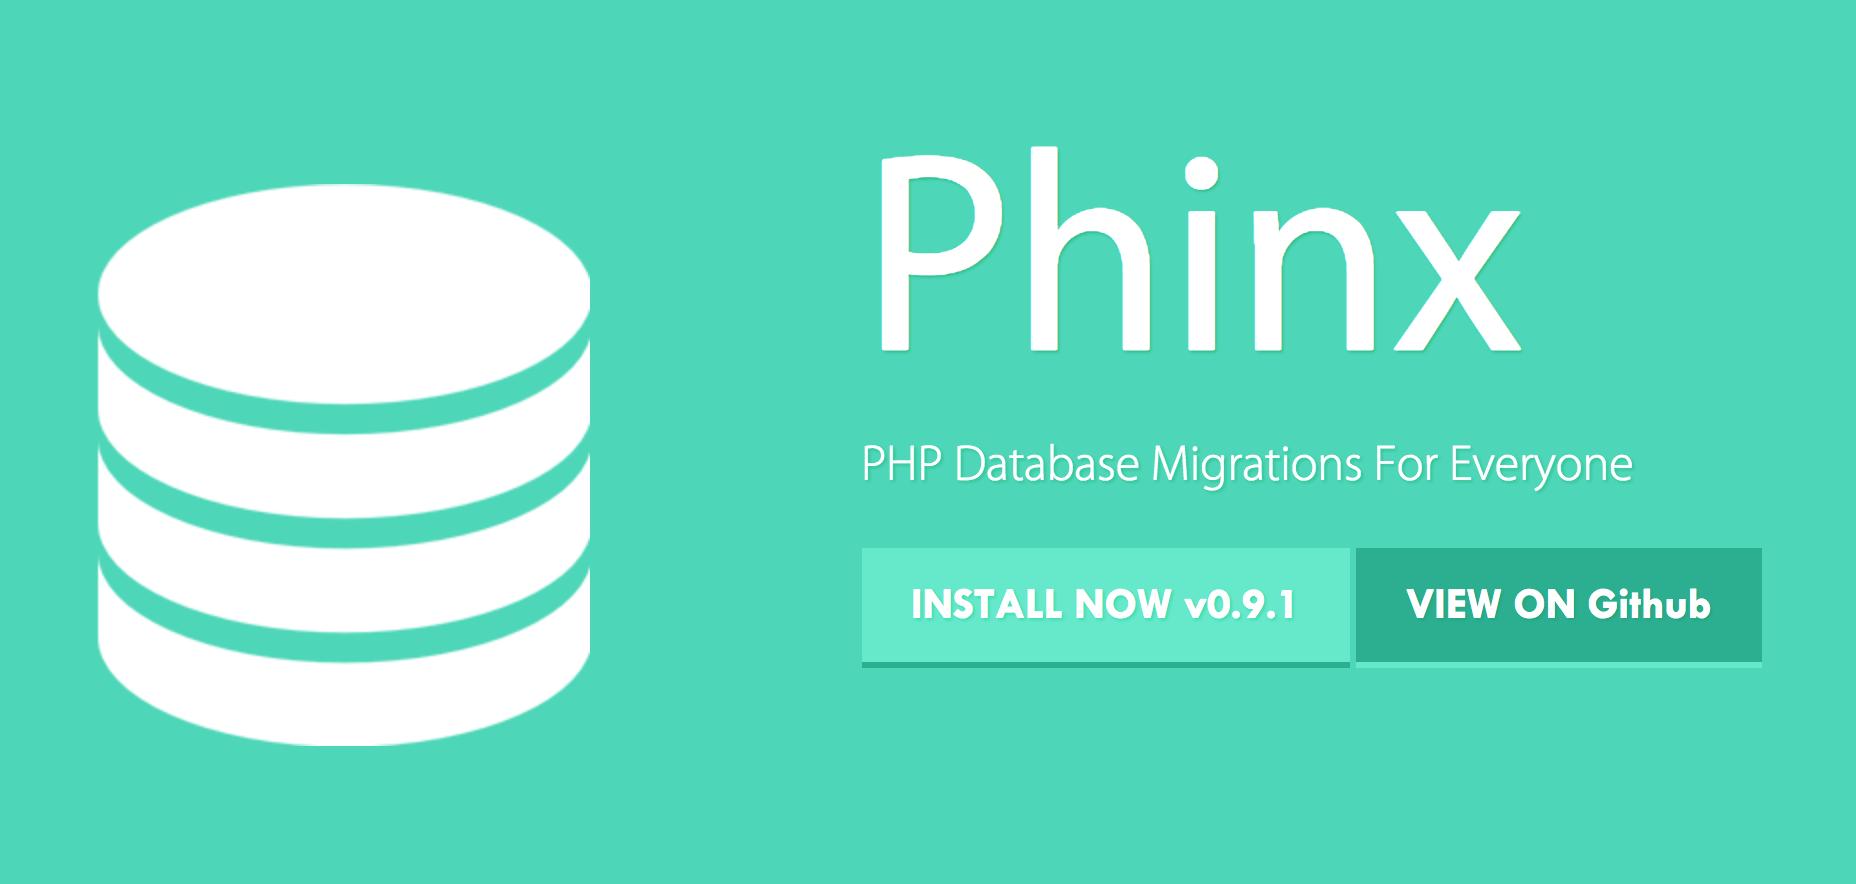 Schema Migration (DB migration) using Phinx